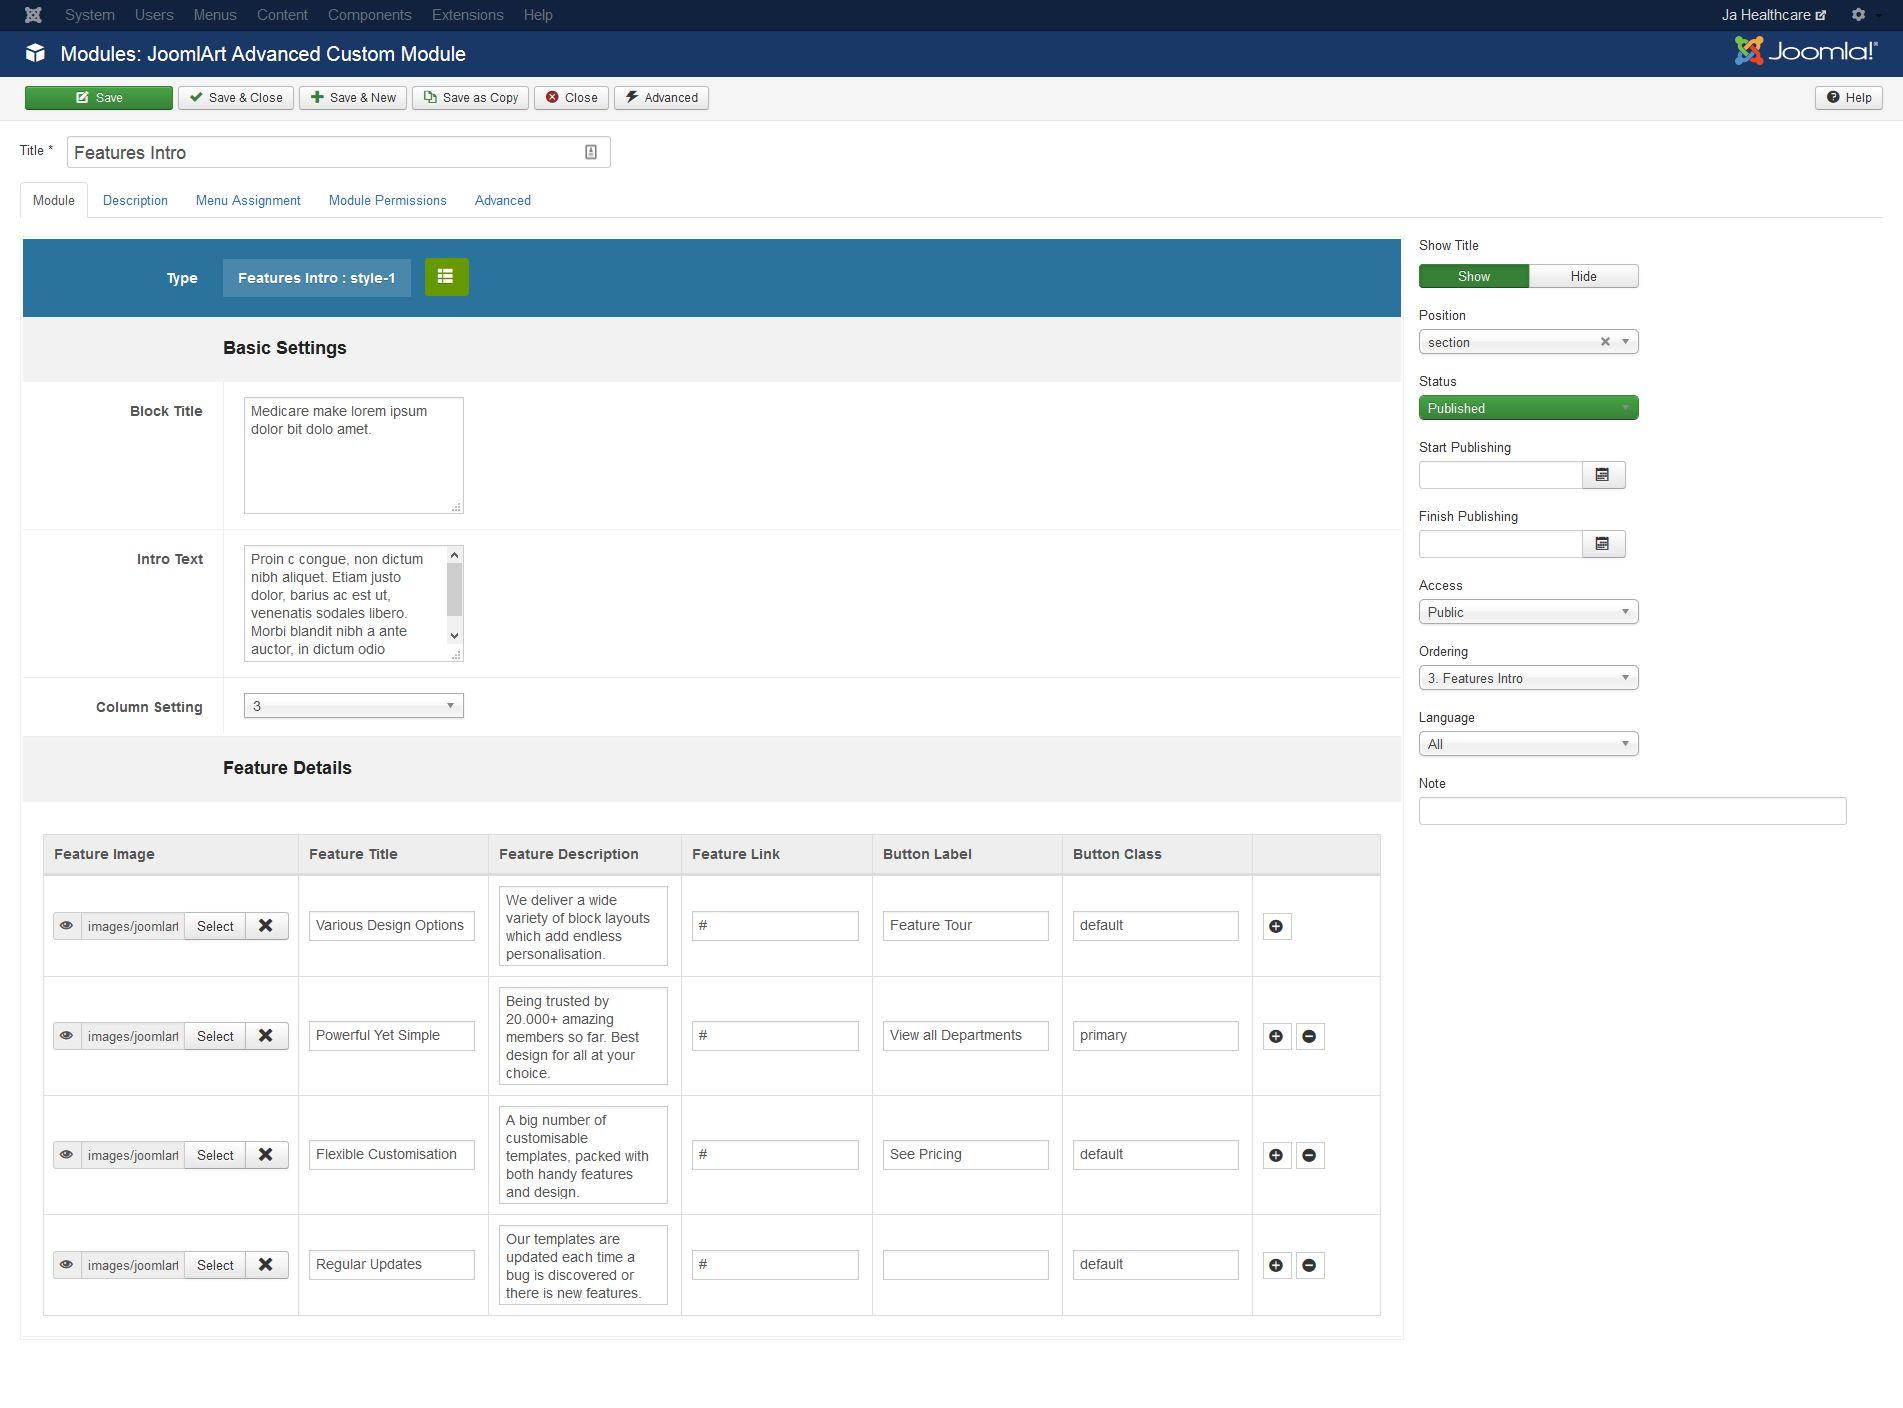 ja healthcare joomla templates and extensions provider